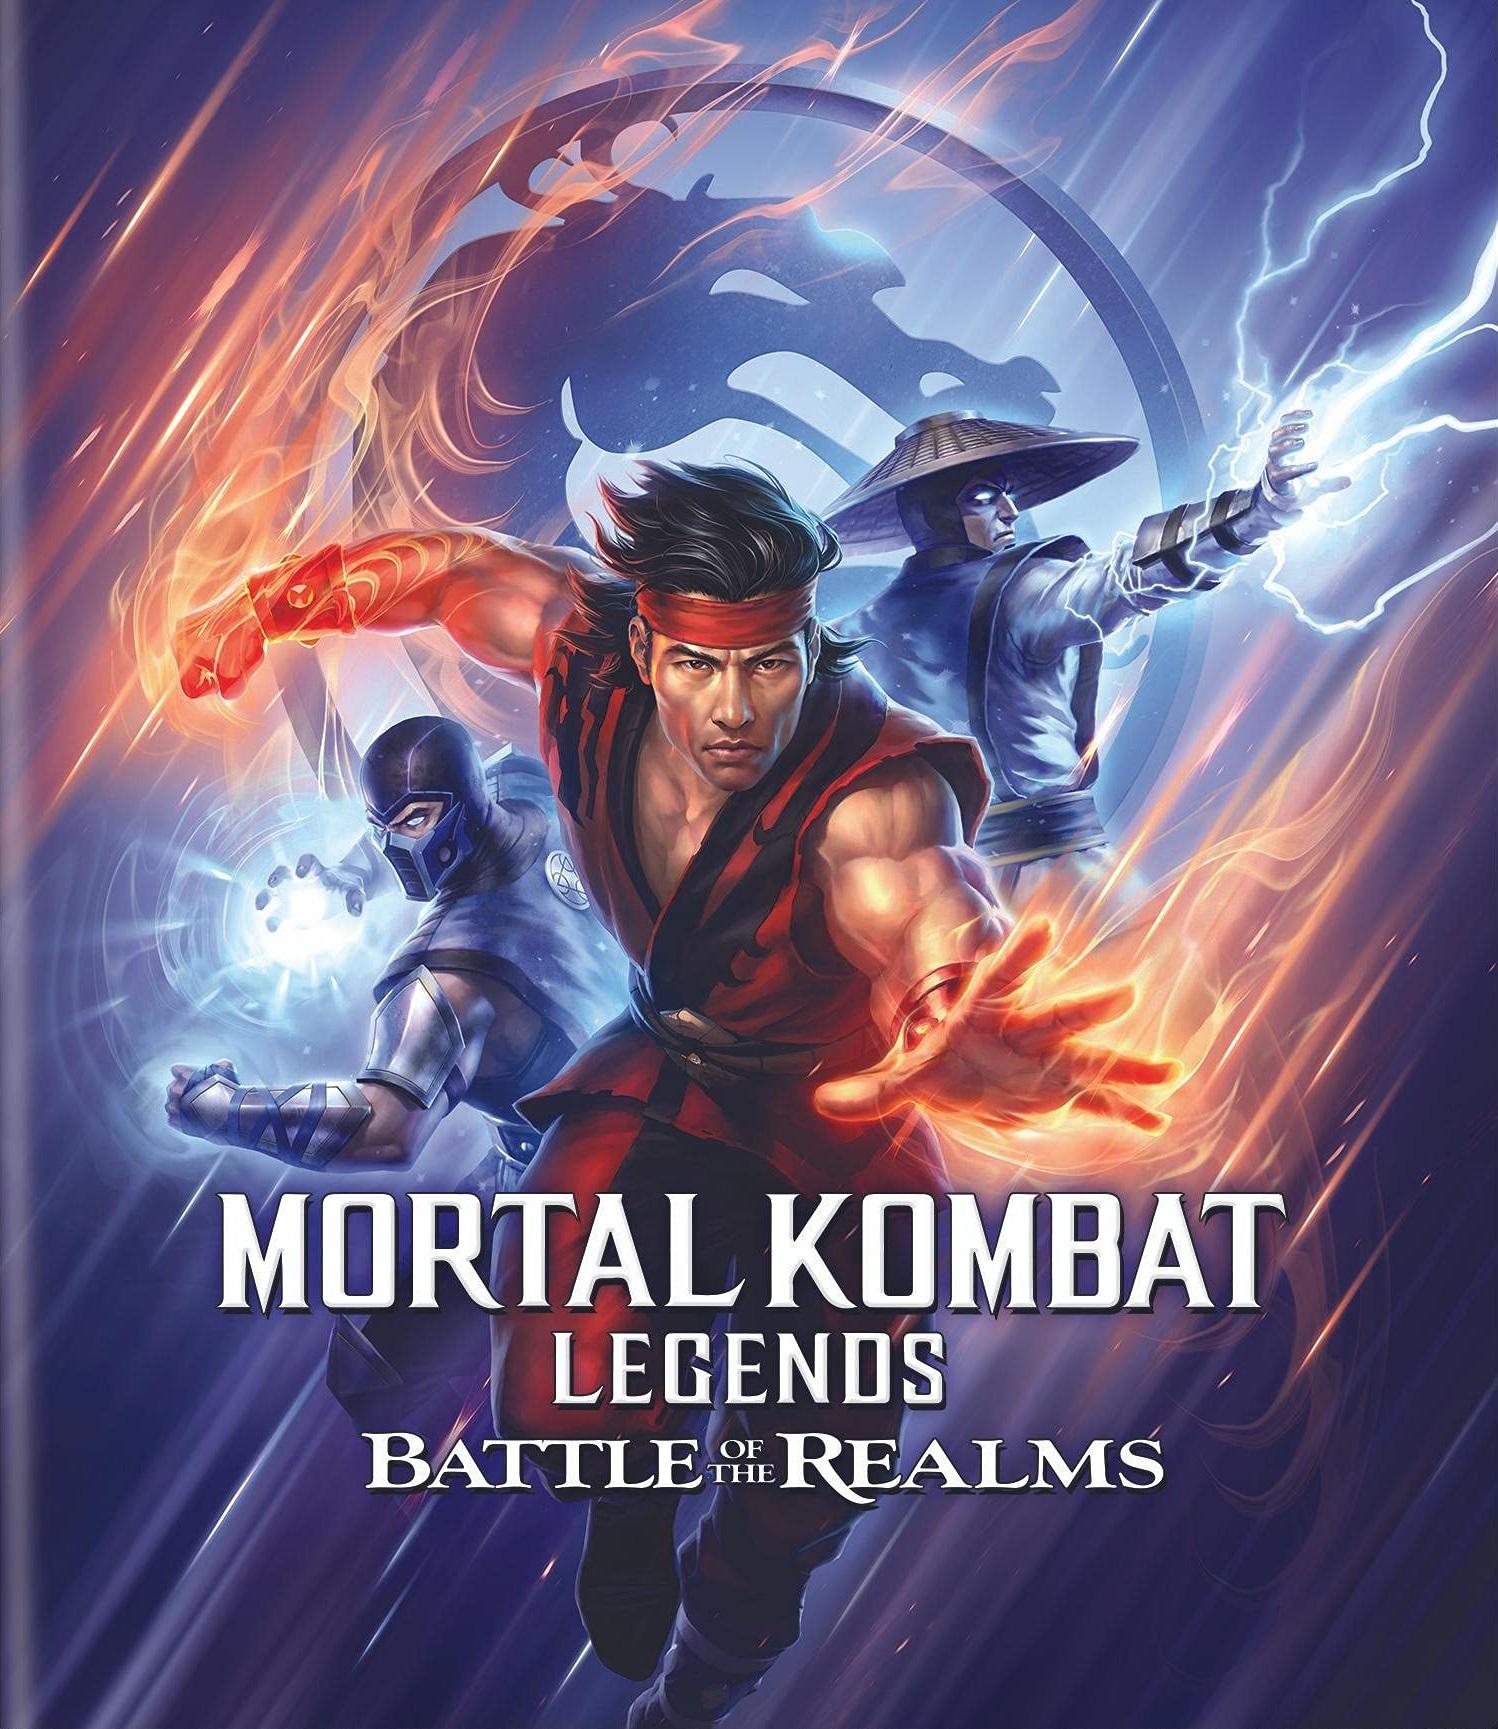 Mortal Kombat Legends Battle of the Realms 2021 English 720p HDRip 800MB Download